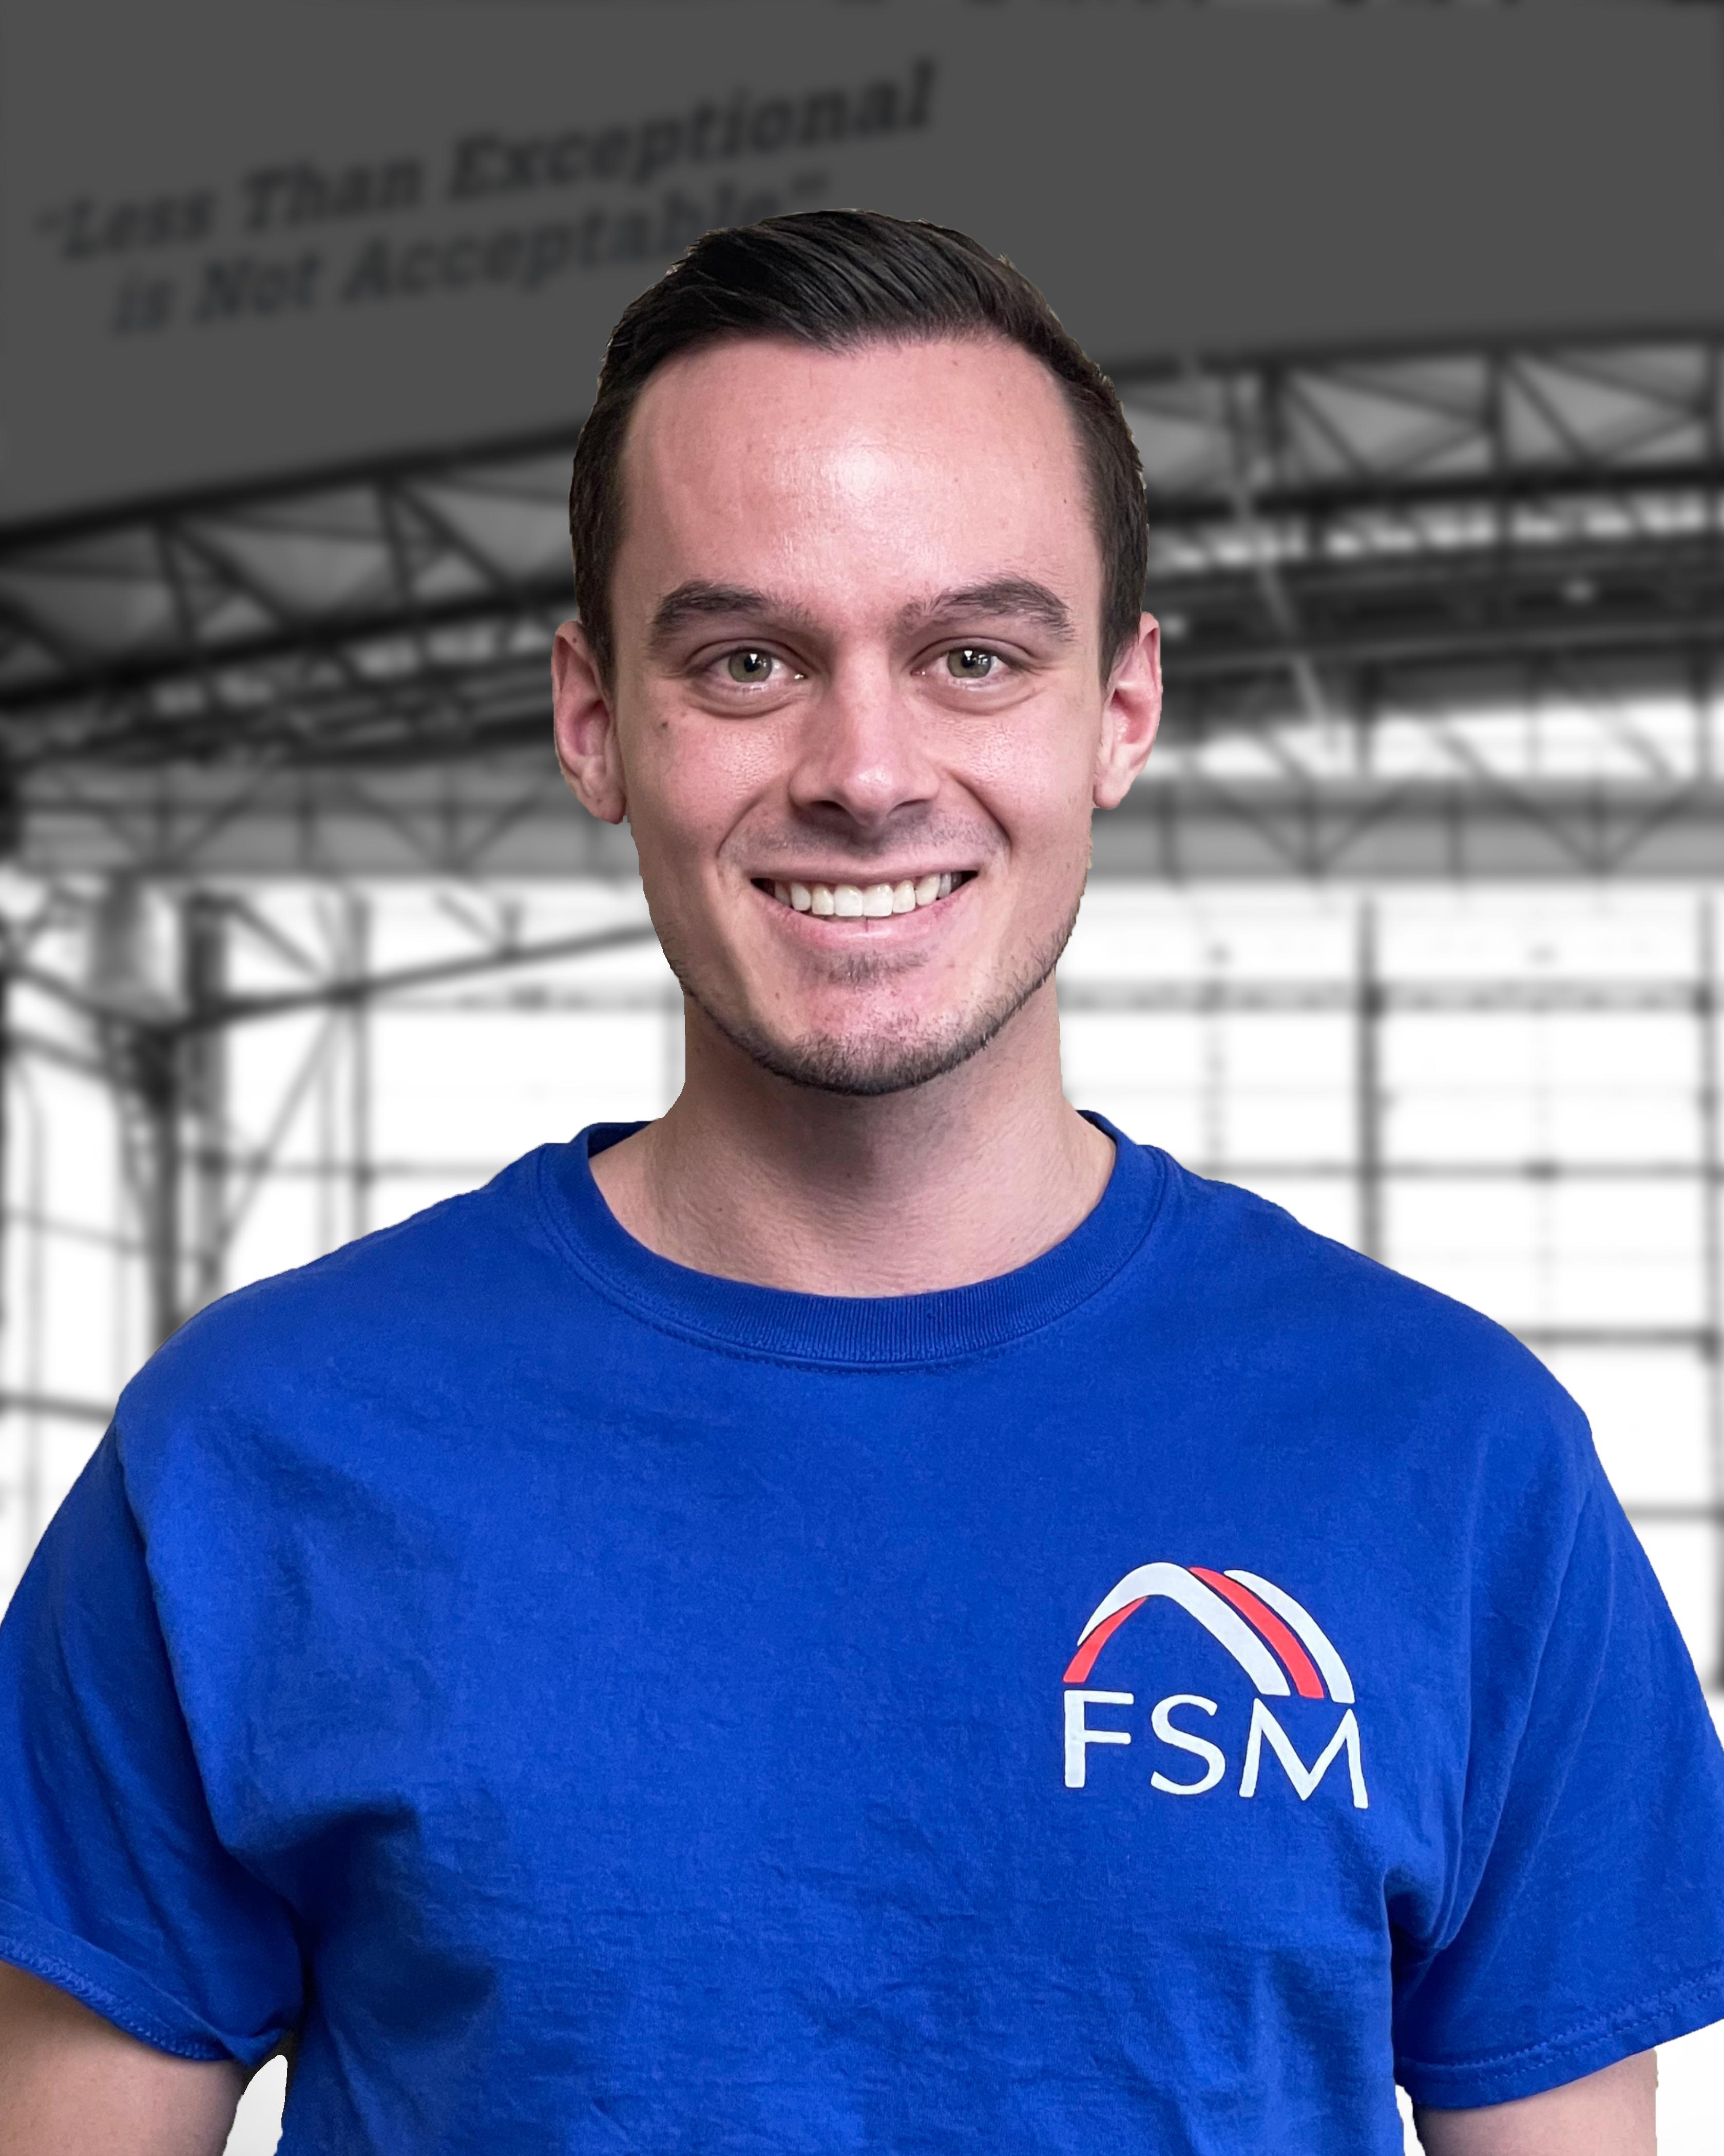 FSM Zachary Simon Inspector